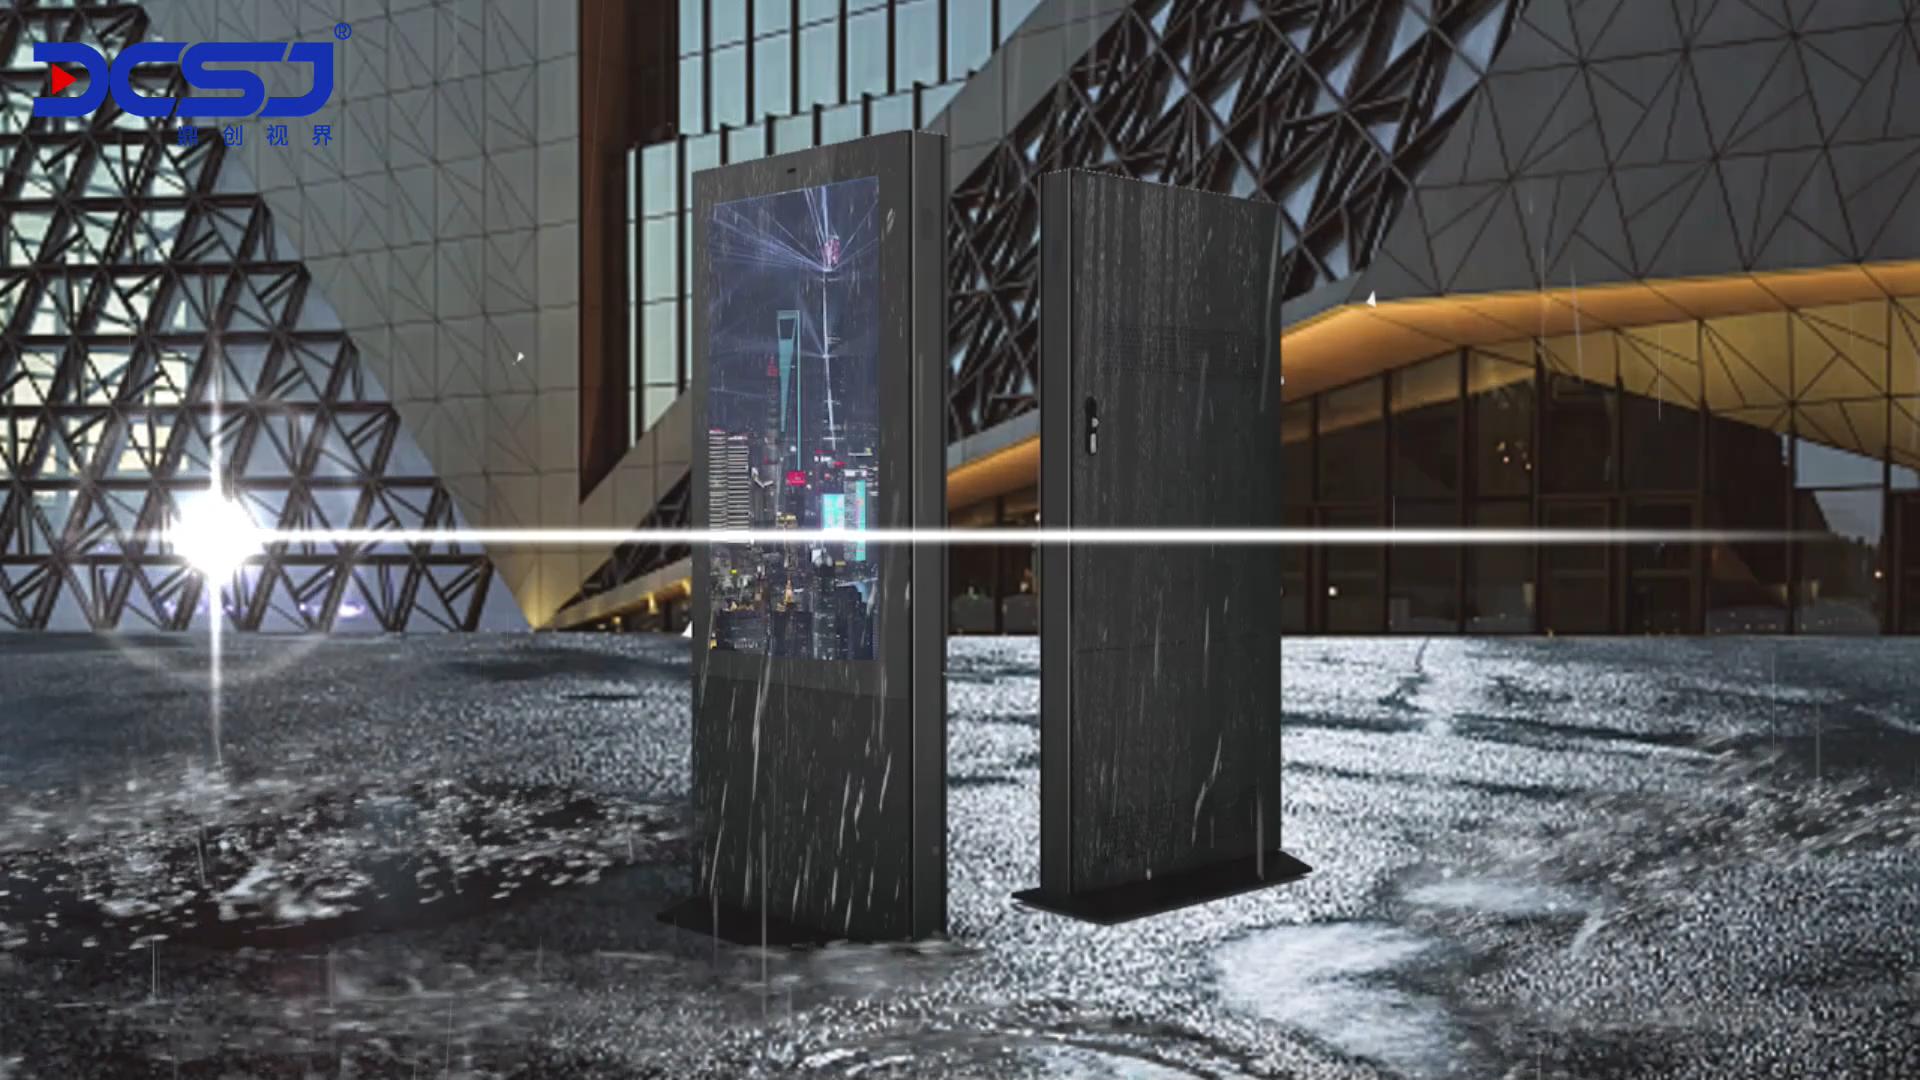 Iklan Outdoor LCD Display Digital Signage Outdoor Papan Informasi Kios